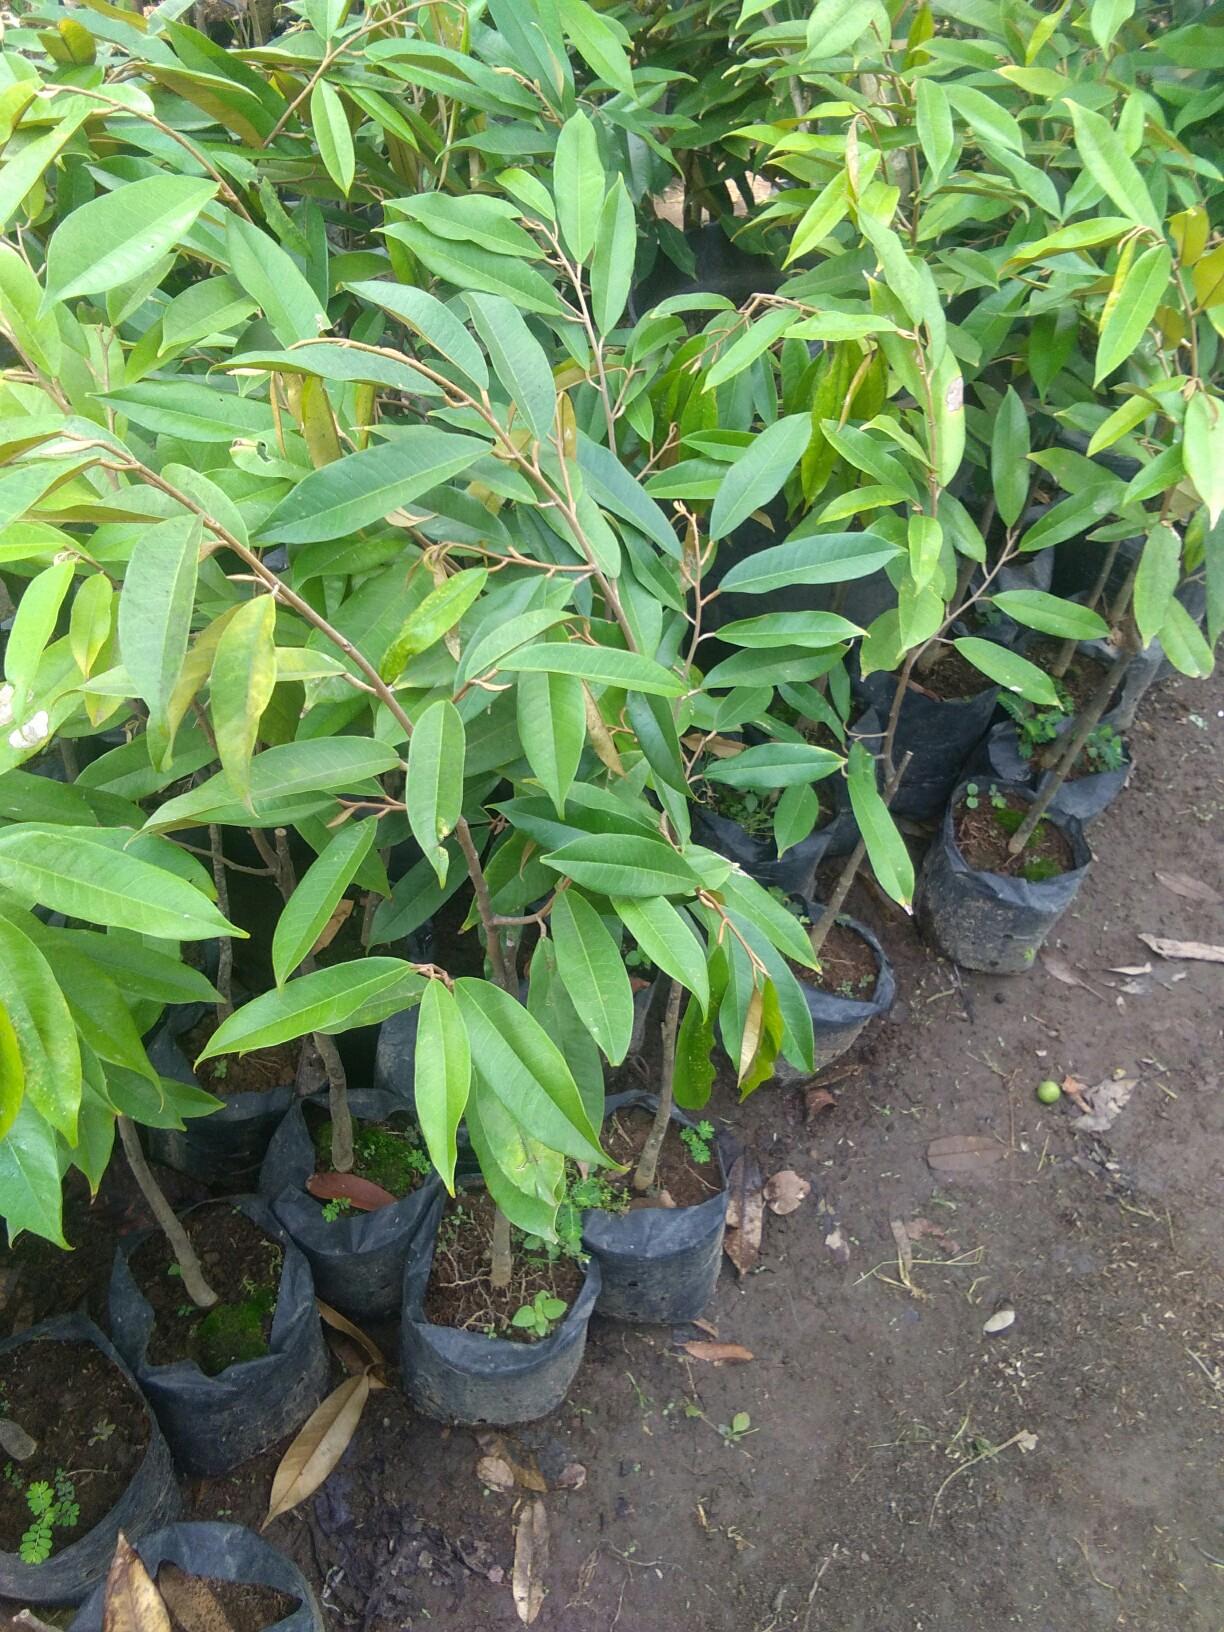 Jual bibit tanaman buah durian musang king